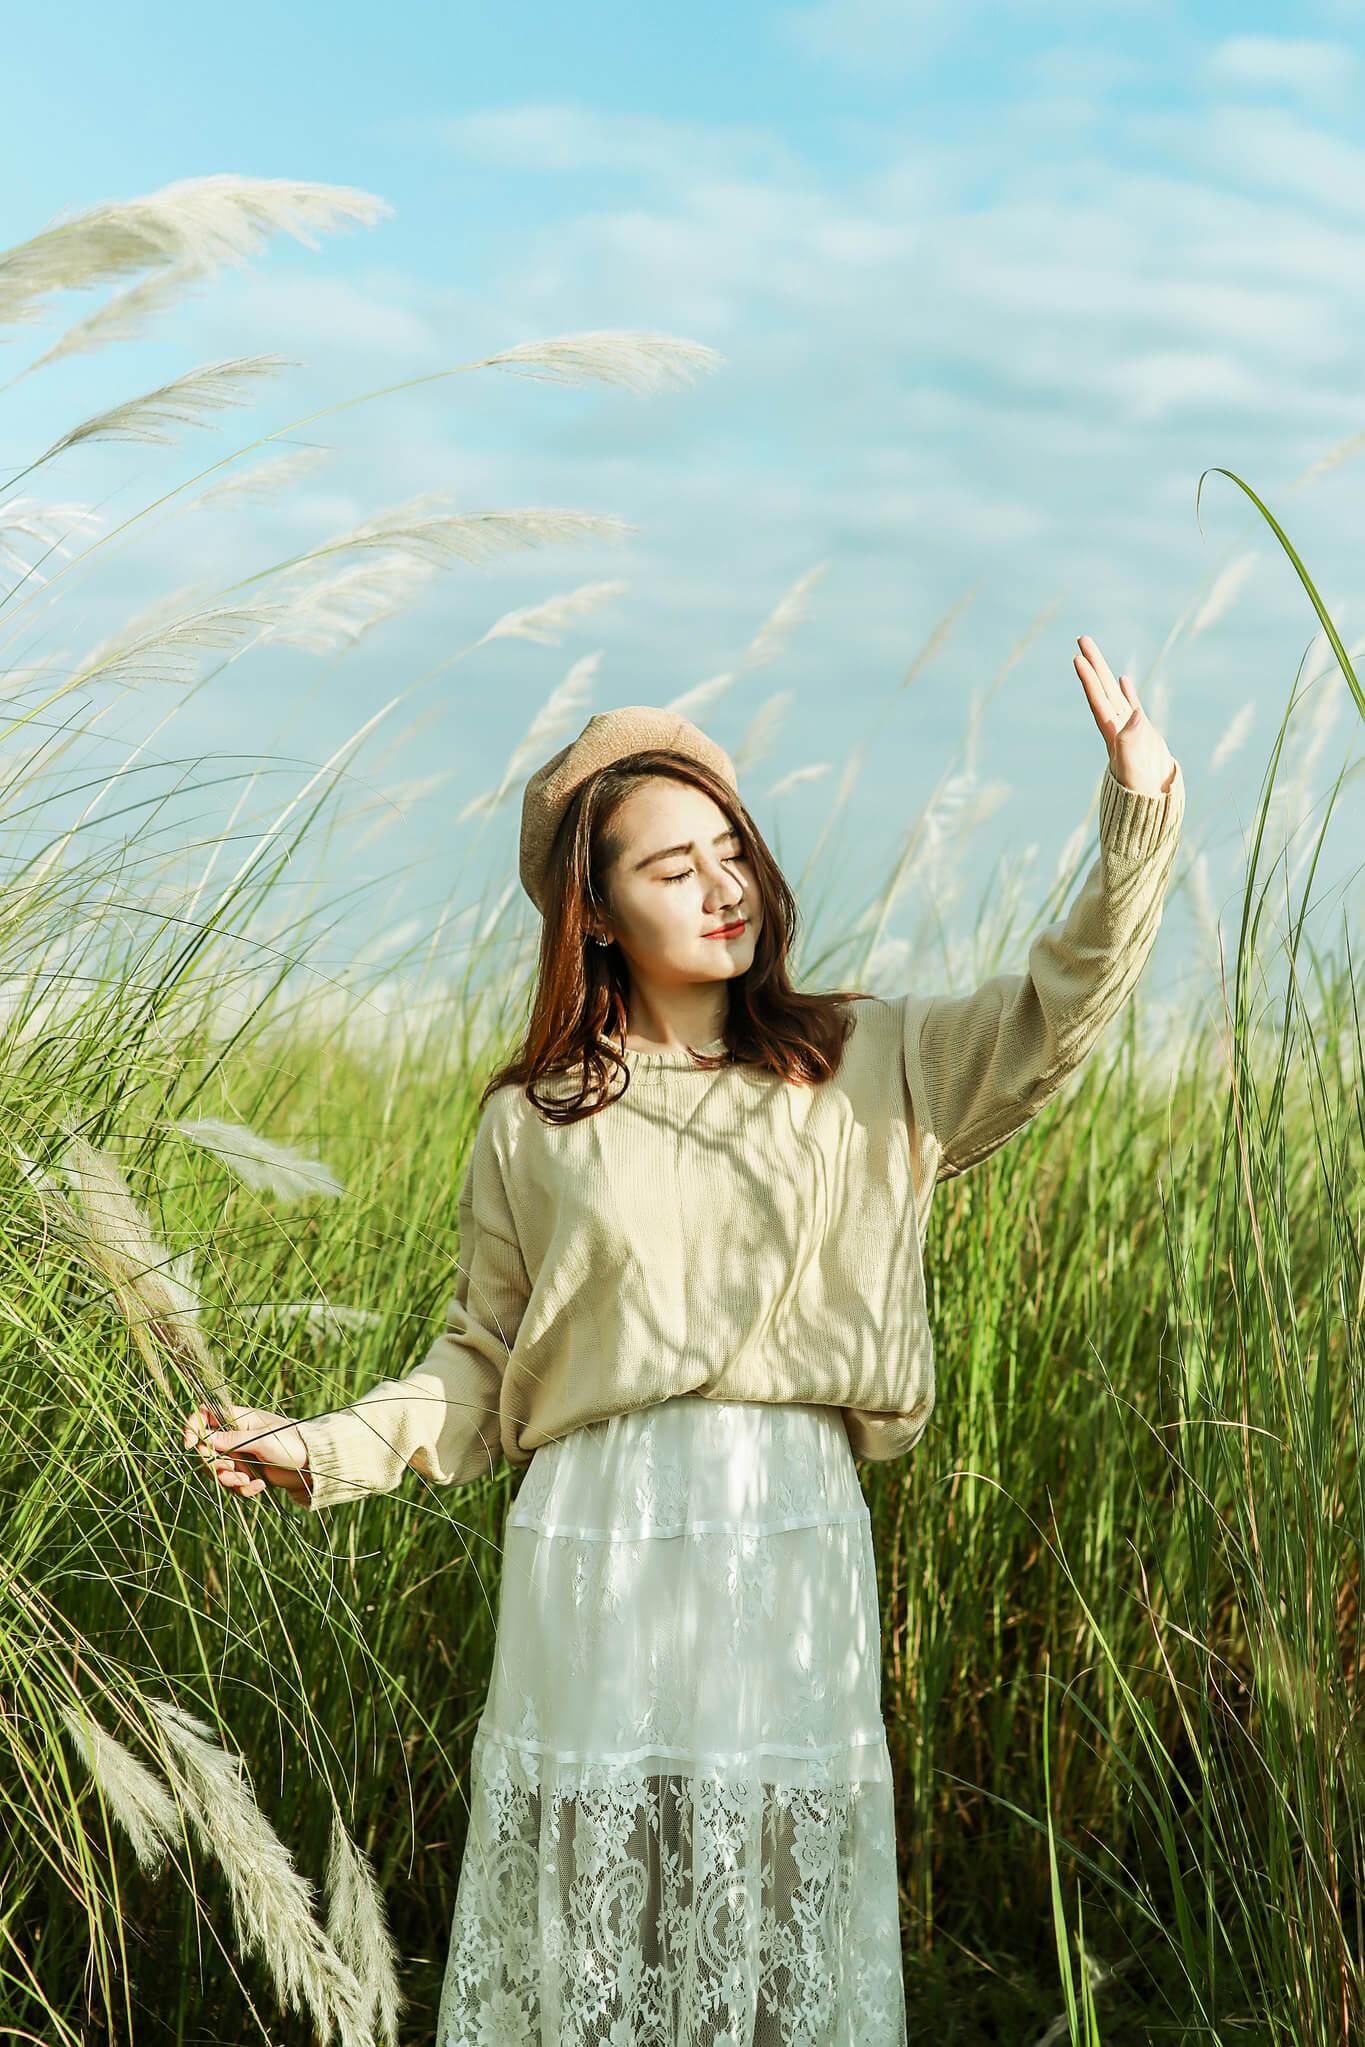 Da Nang Den Hen Lai Len Mua Co Lau Den Roi Danang Fantasticity Com 06